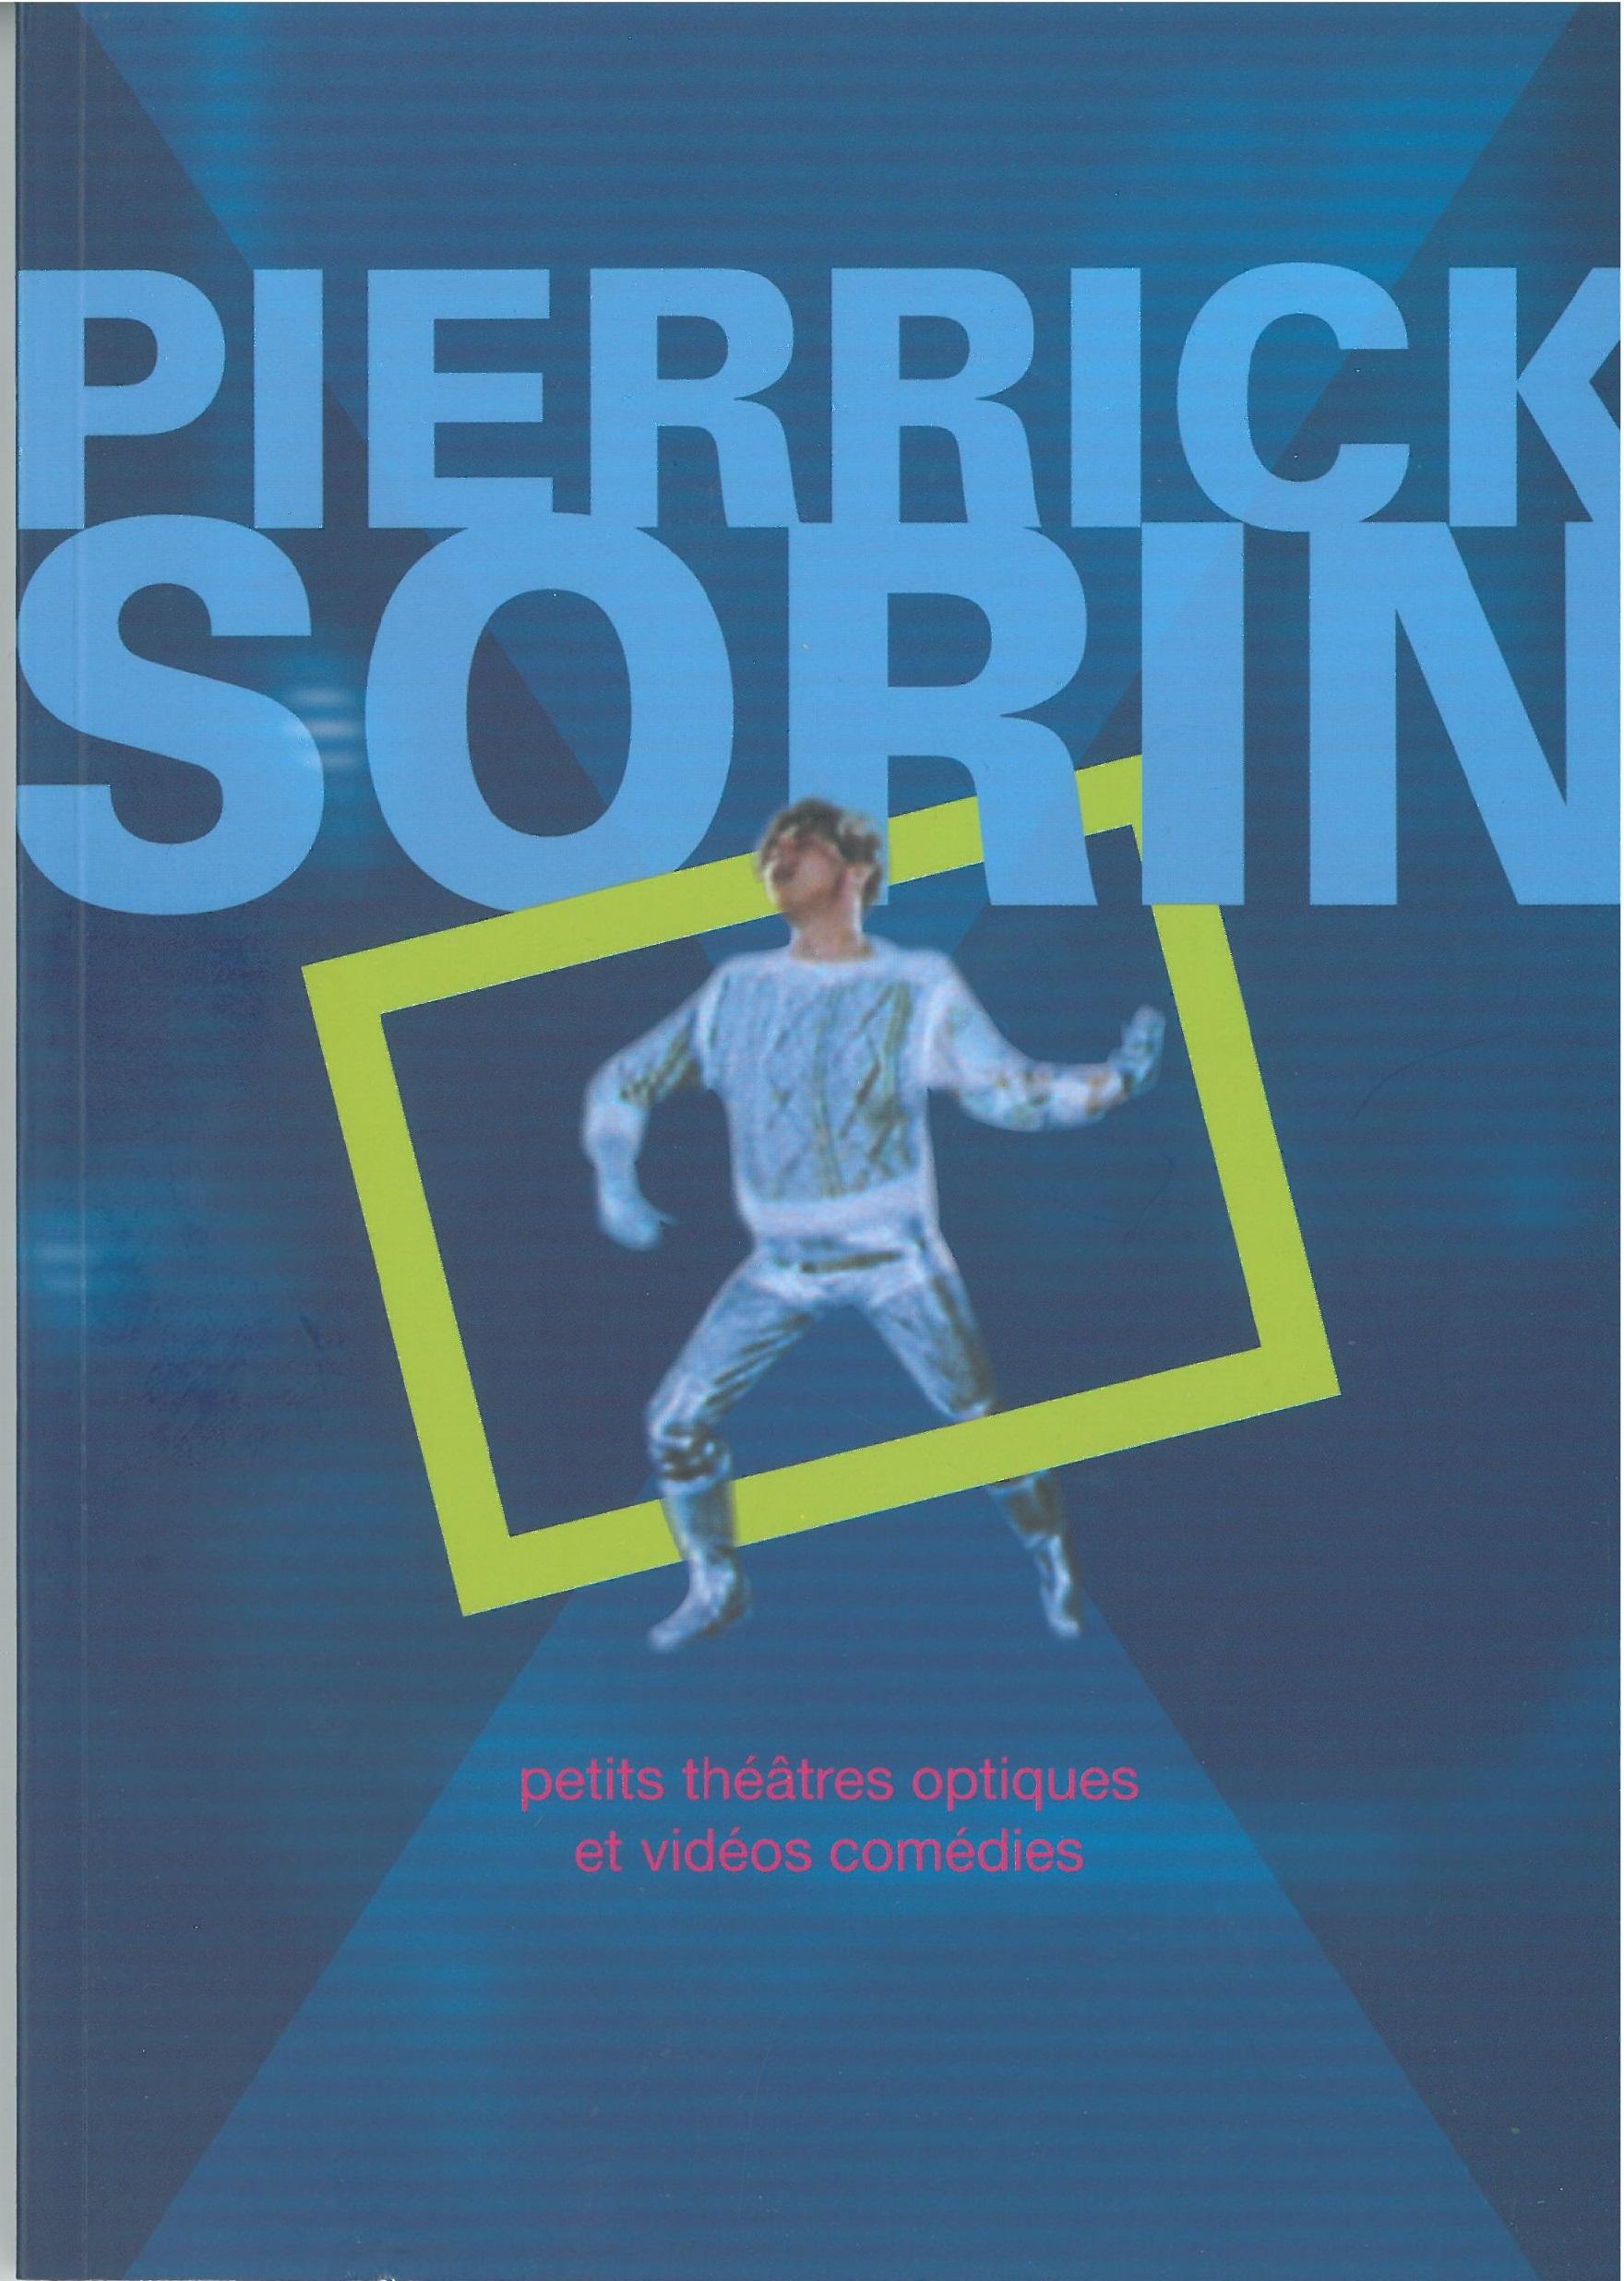 Pierrick Sorin 2005